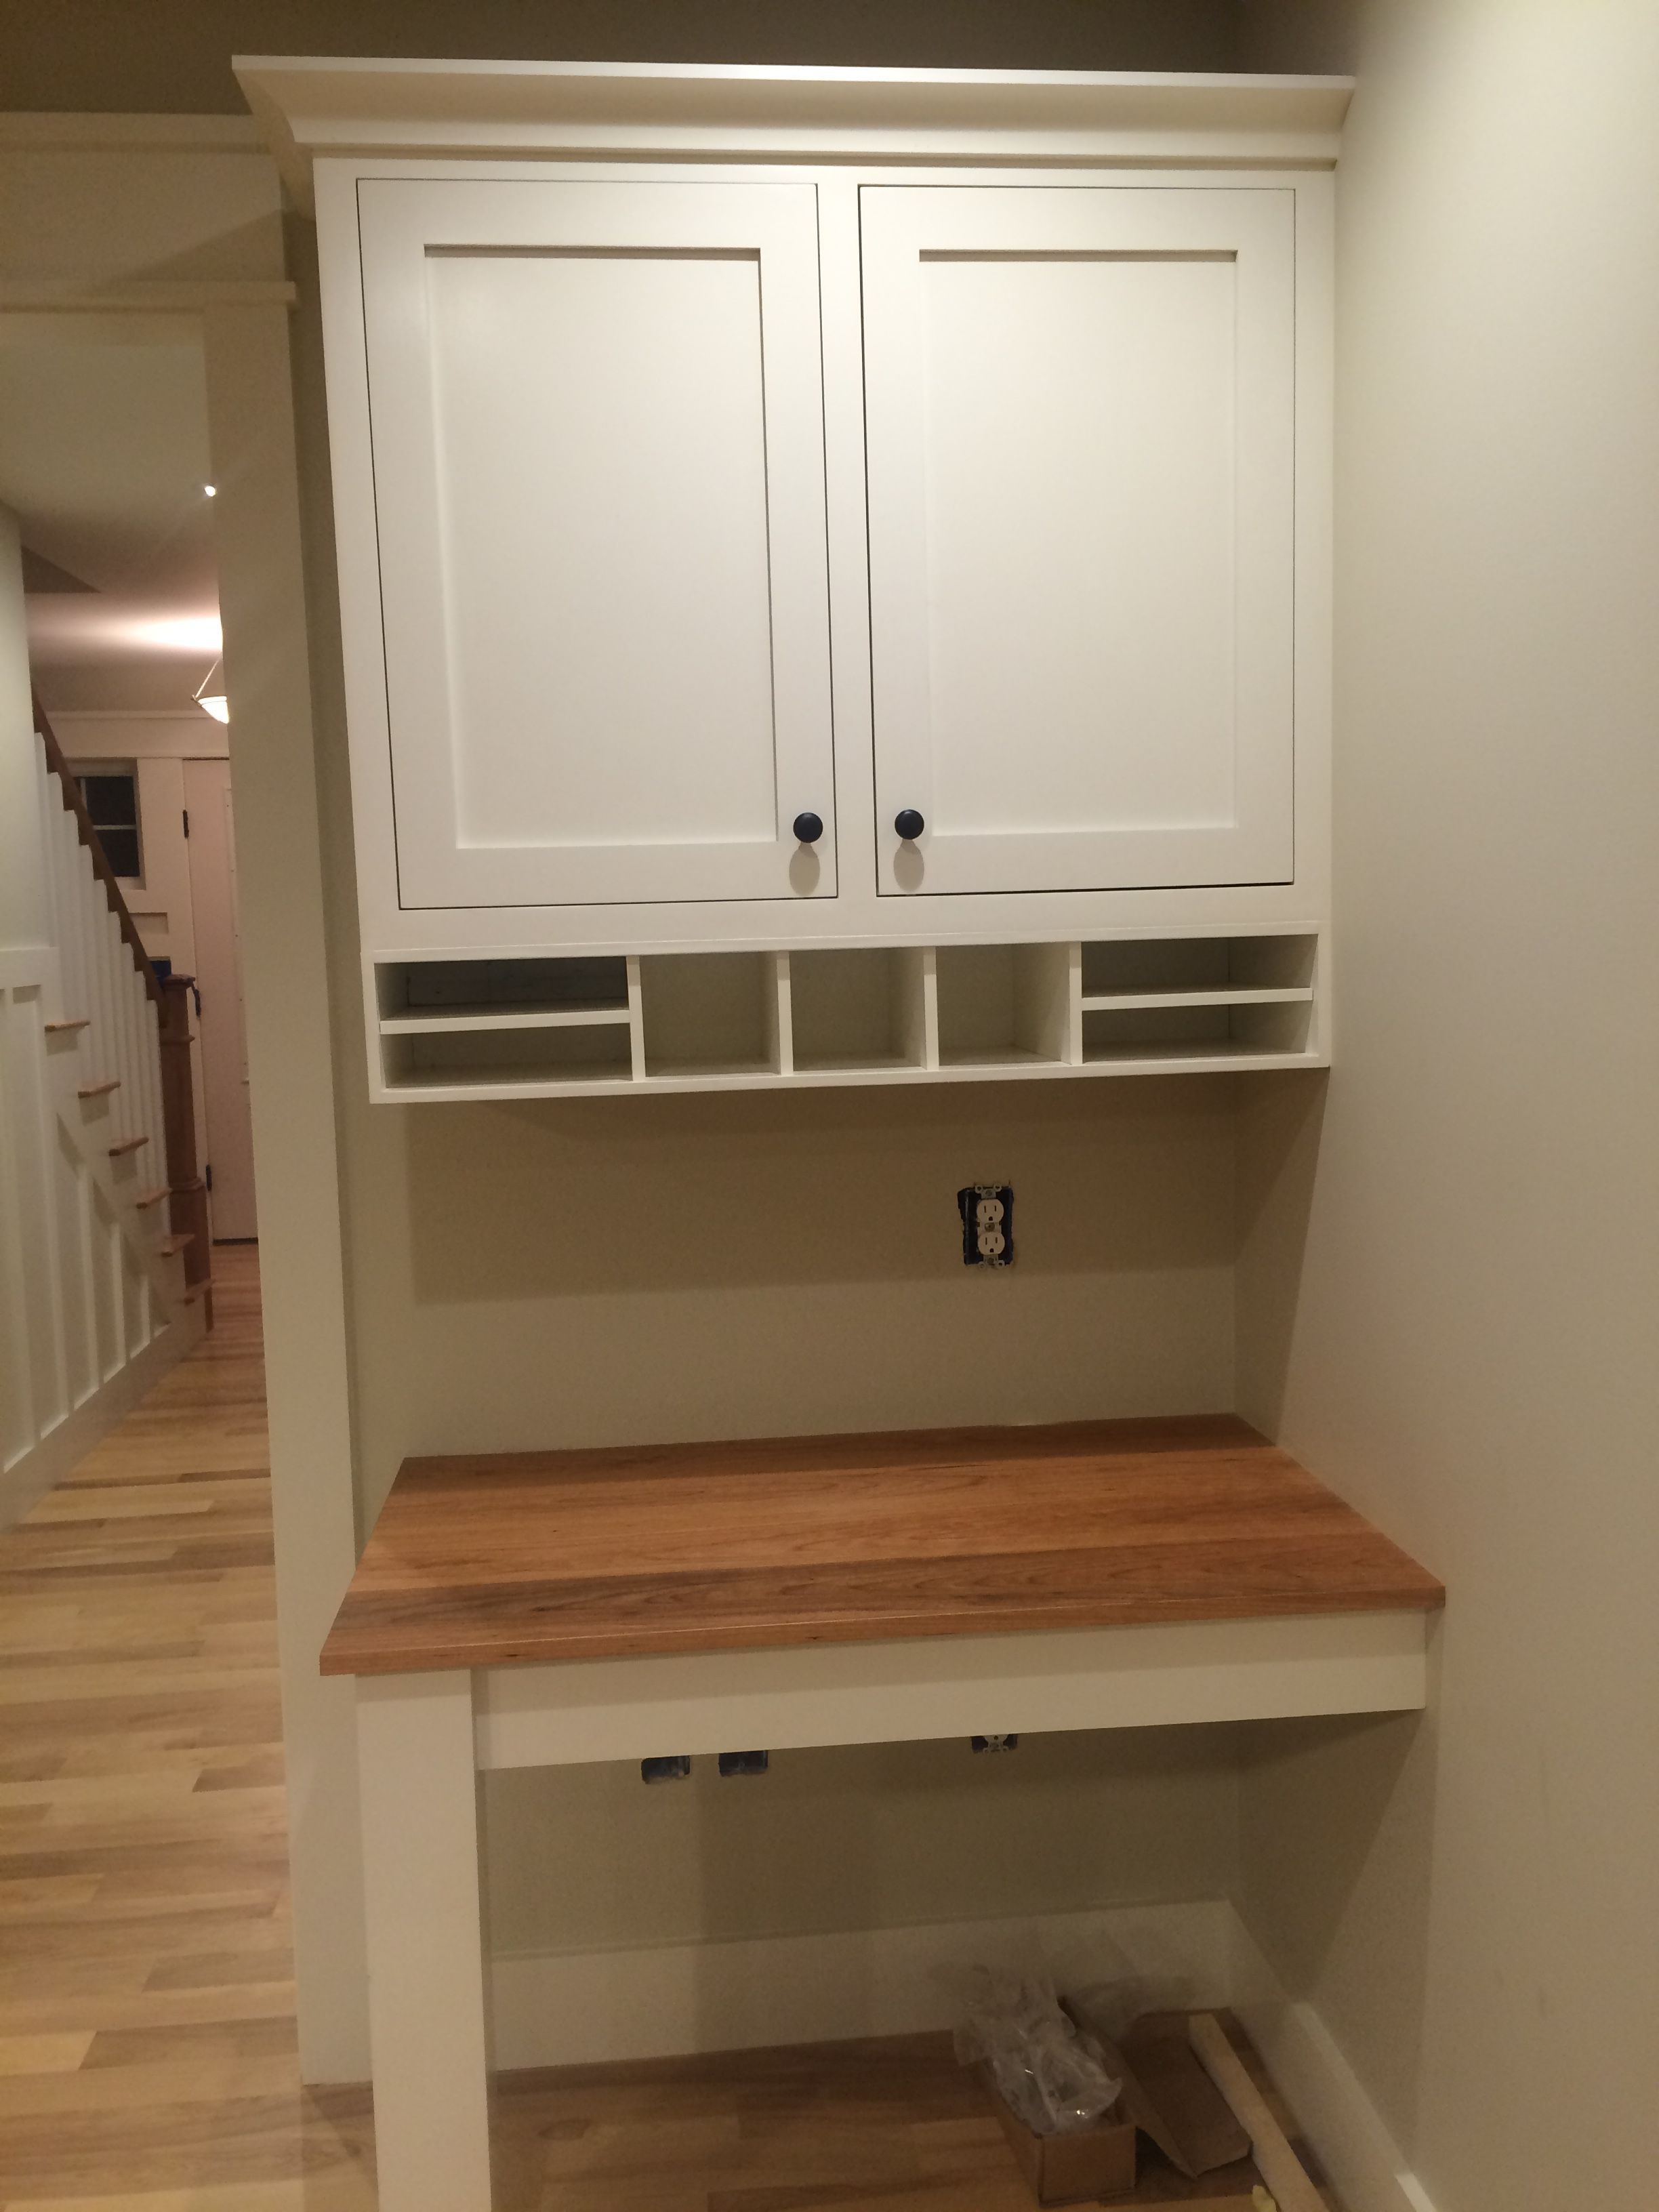 How To Make A Desk Out Of Kitchen Cabinets Modern Home Office Furniture Bookshelf Desk Computer Desks For Home